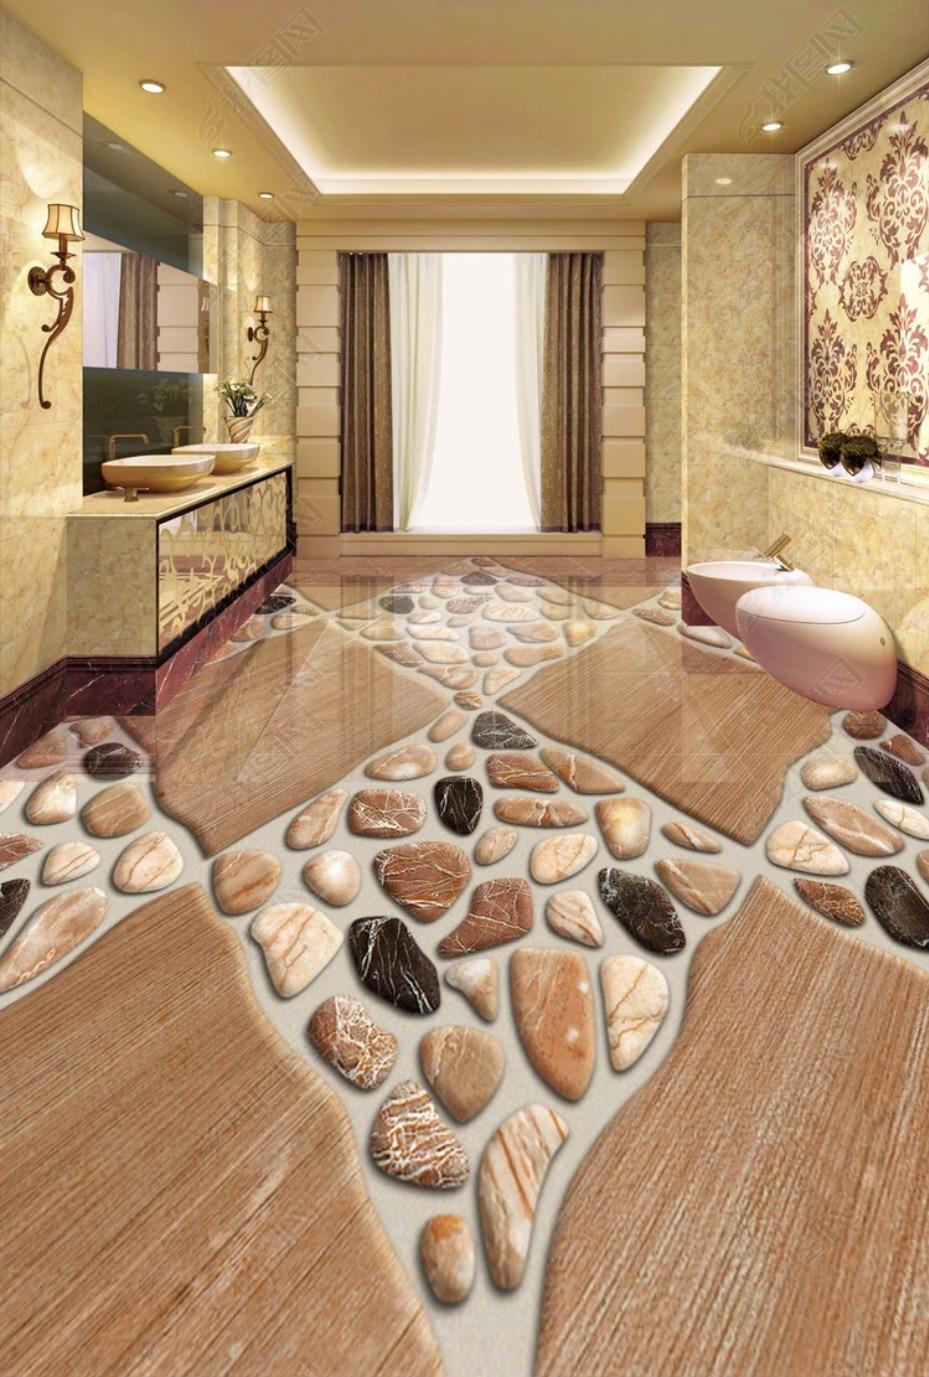 Flooring Painting Natural Stone